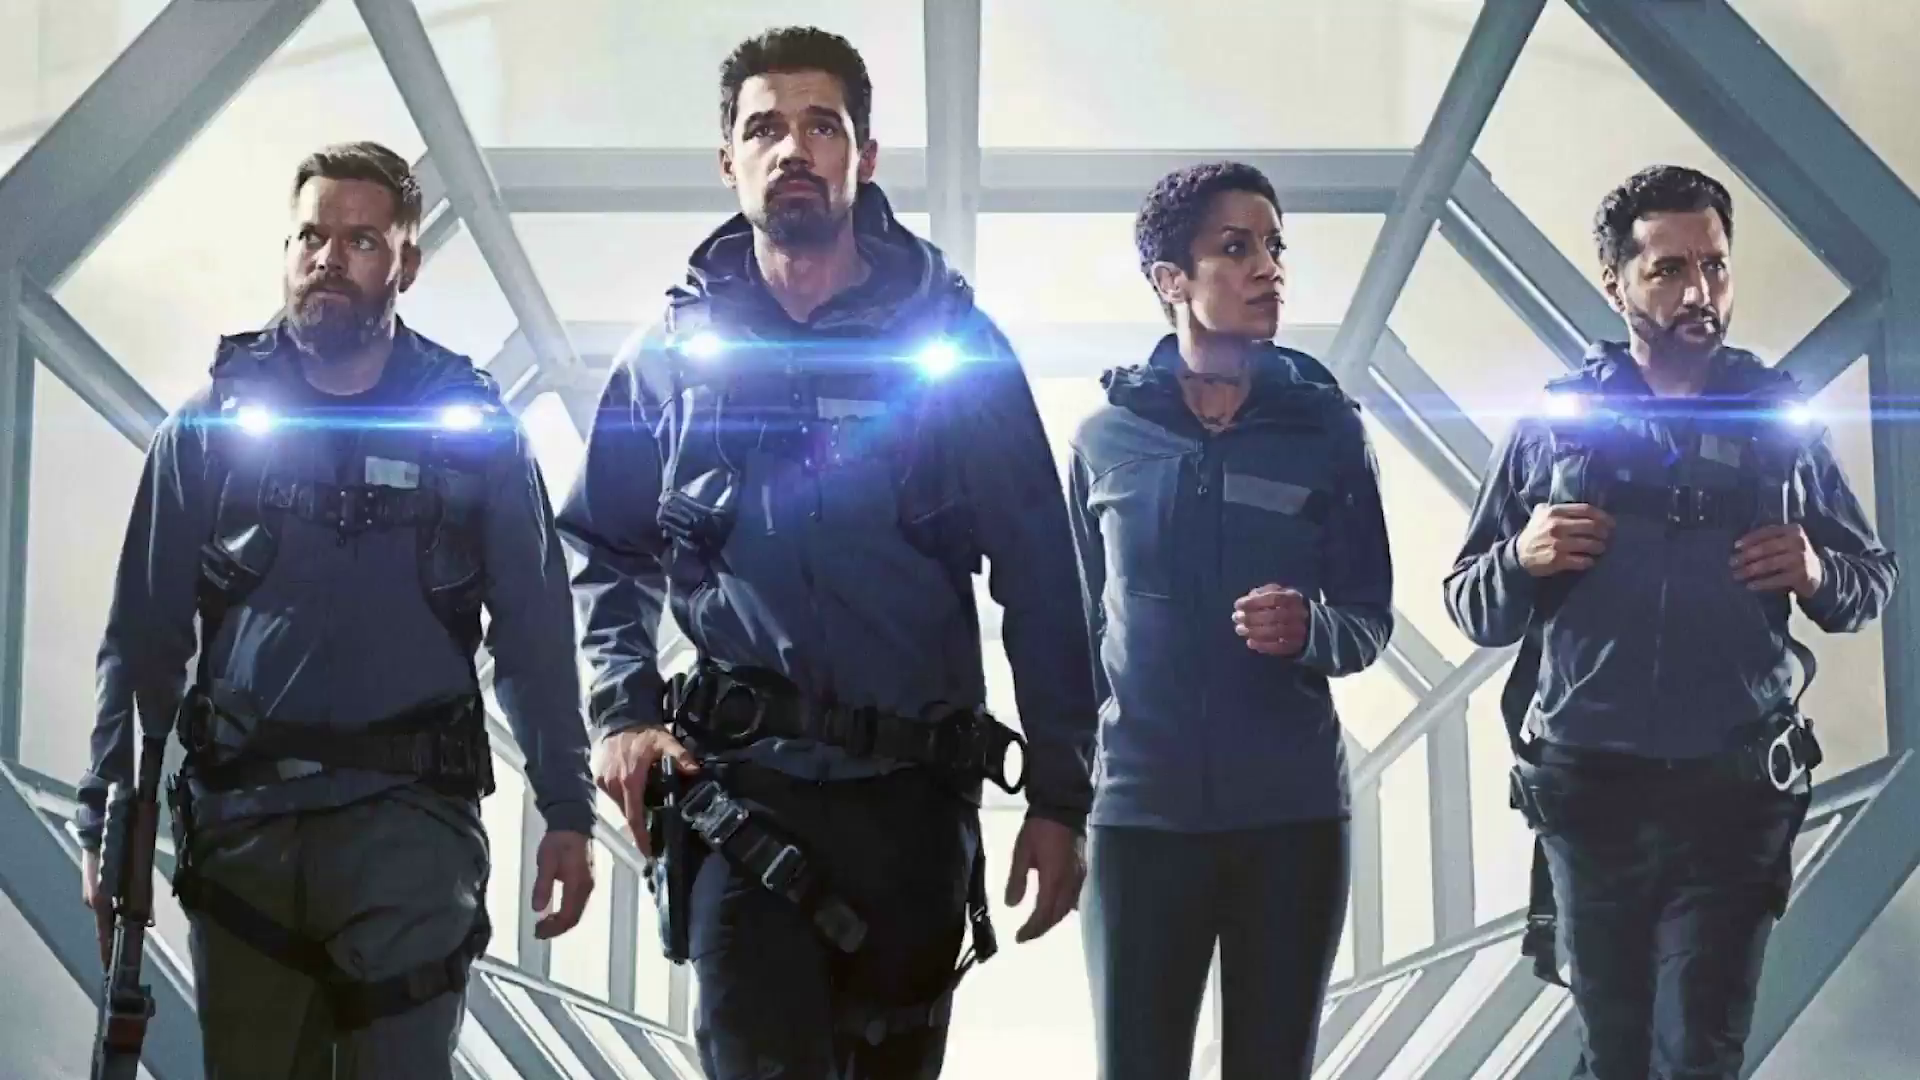 The Expanse Season 5 Release Date: Steven Strait Returning this December, Get Ready